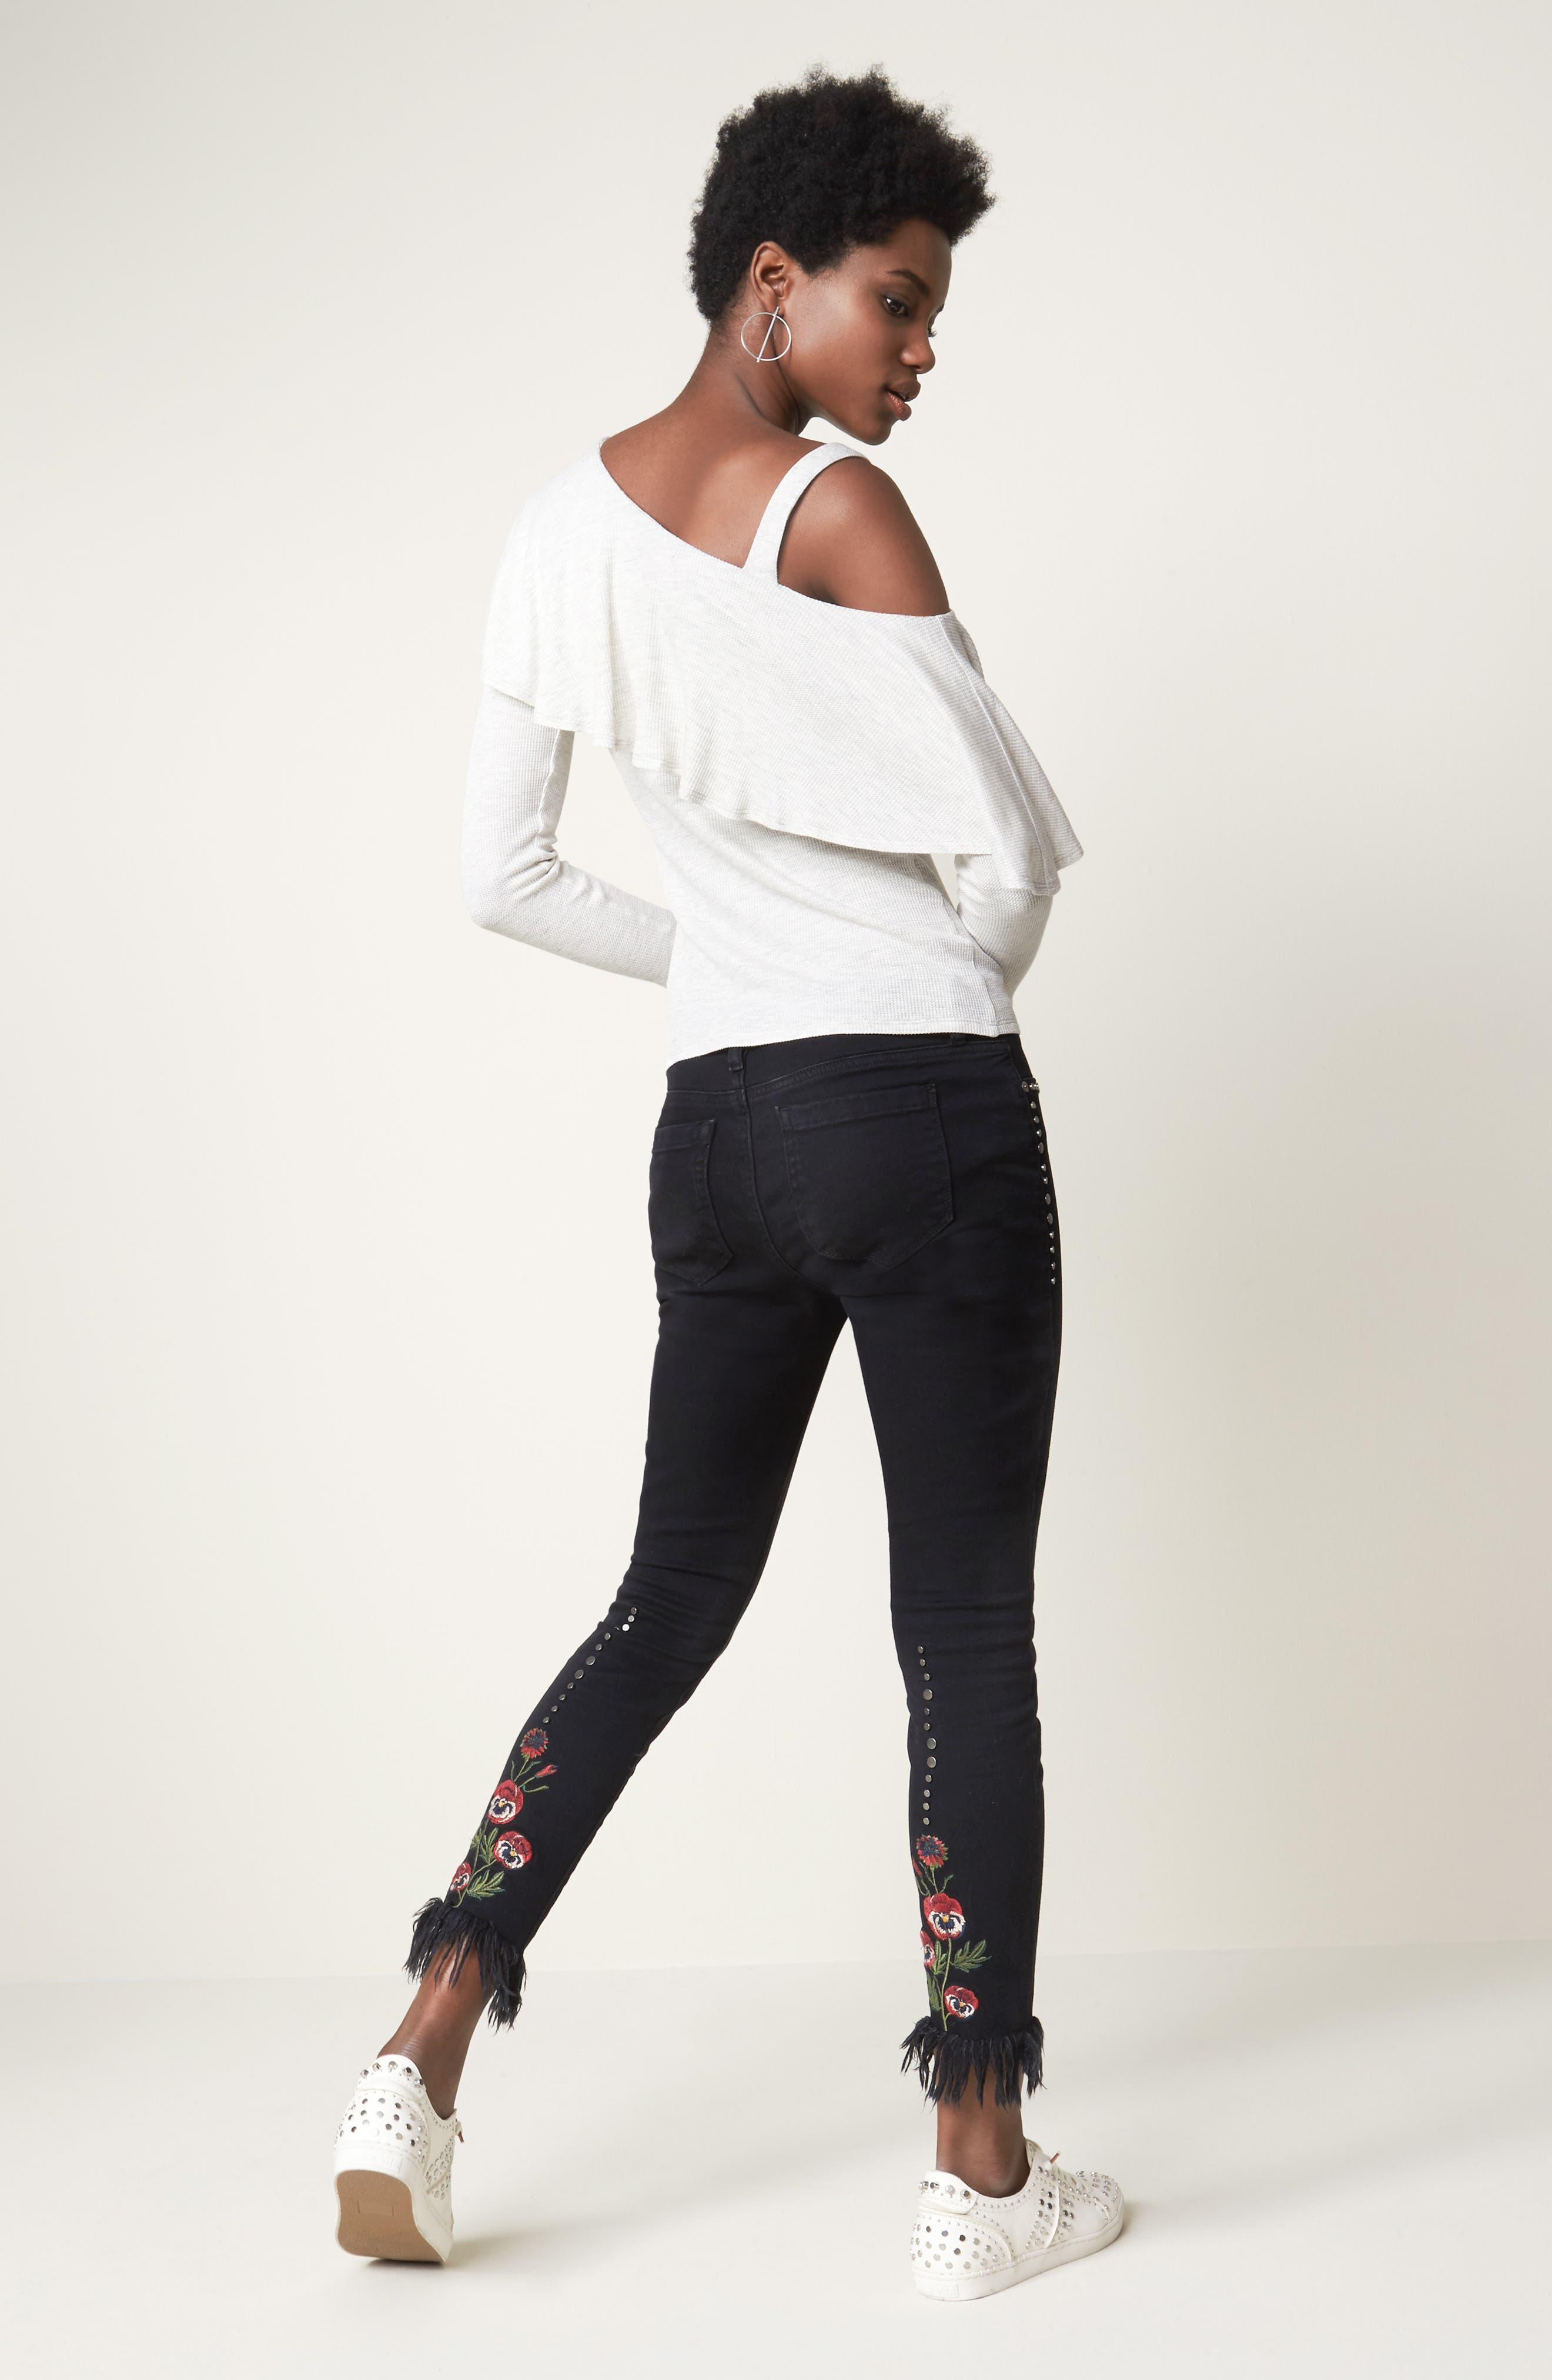 Embroidered & Studded Skinny Jeans,                             Alternate thumbnail 7, color,                             Hidden Talent Black